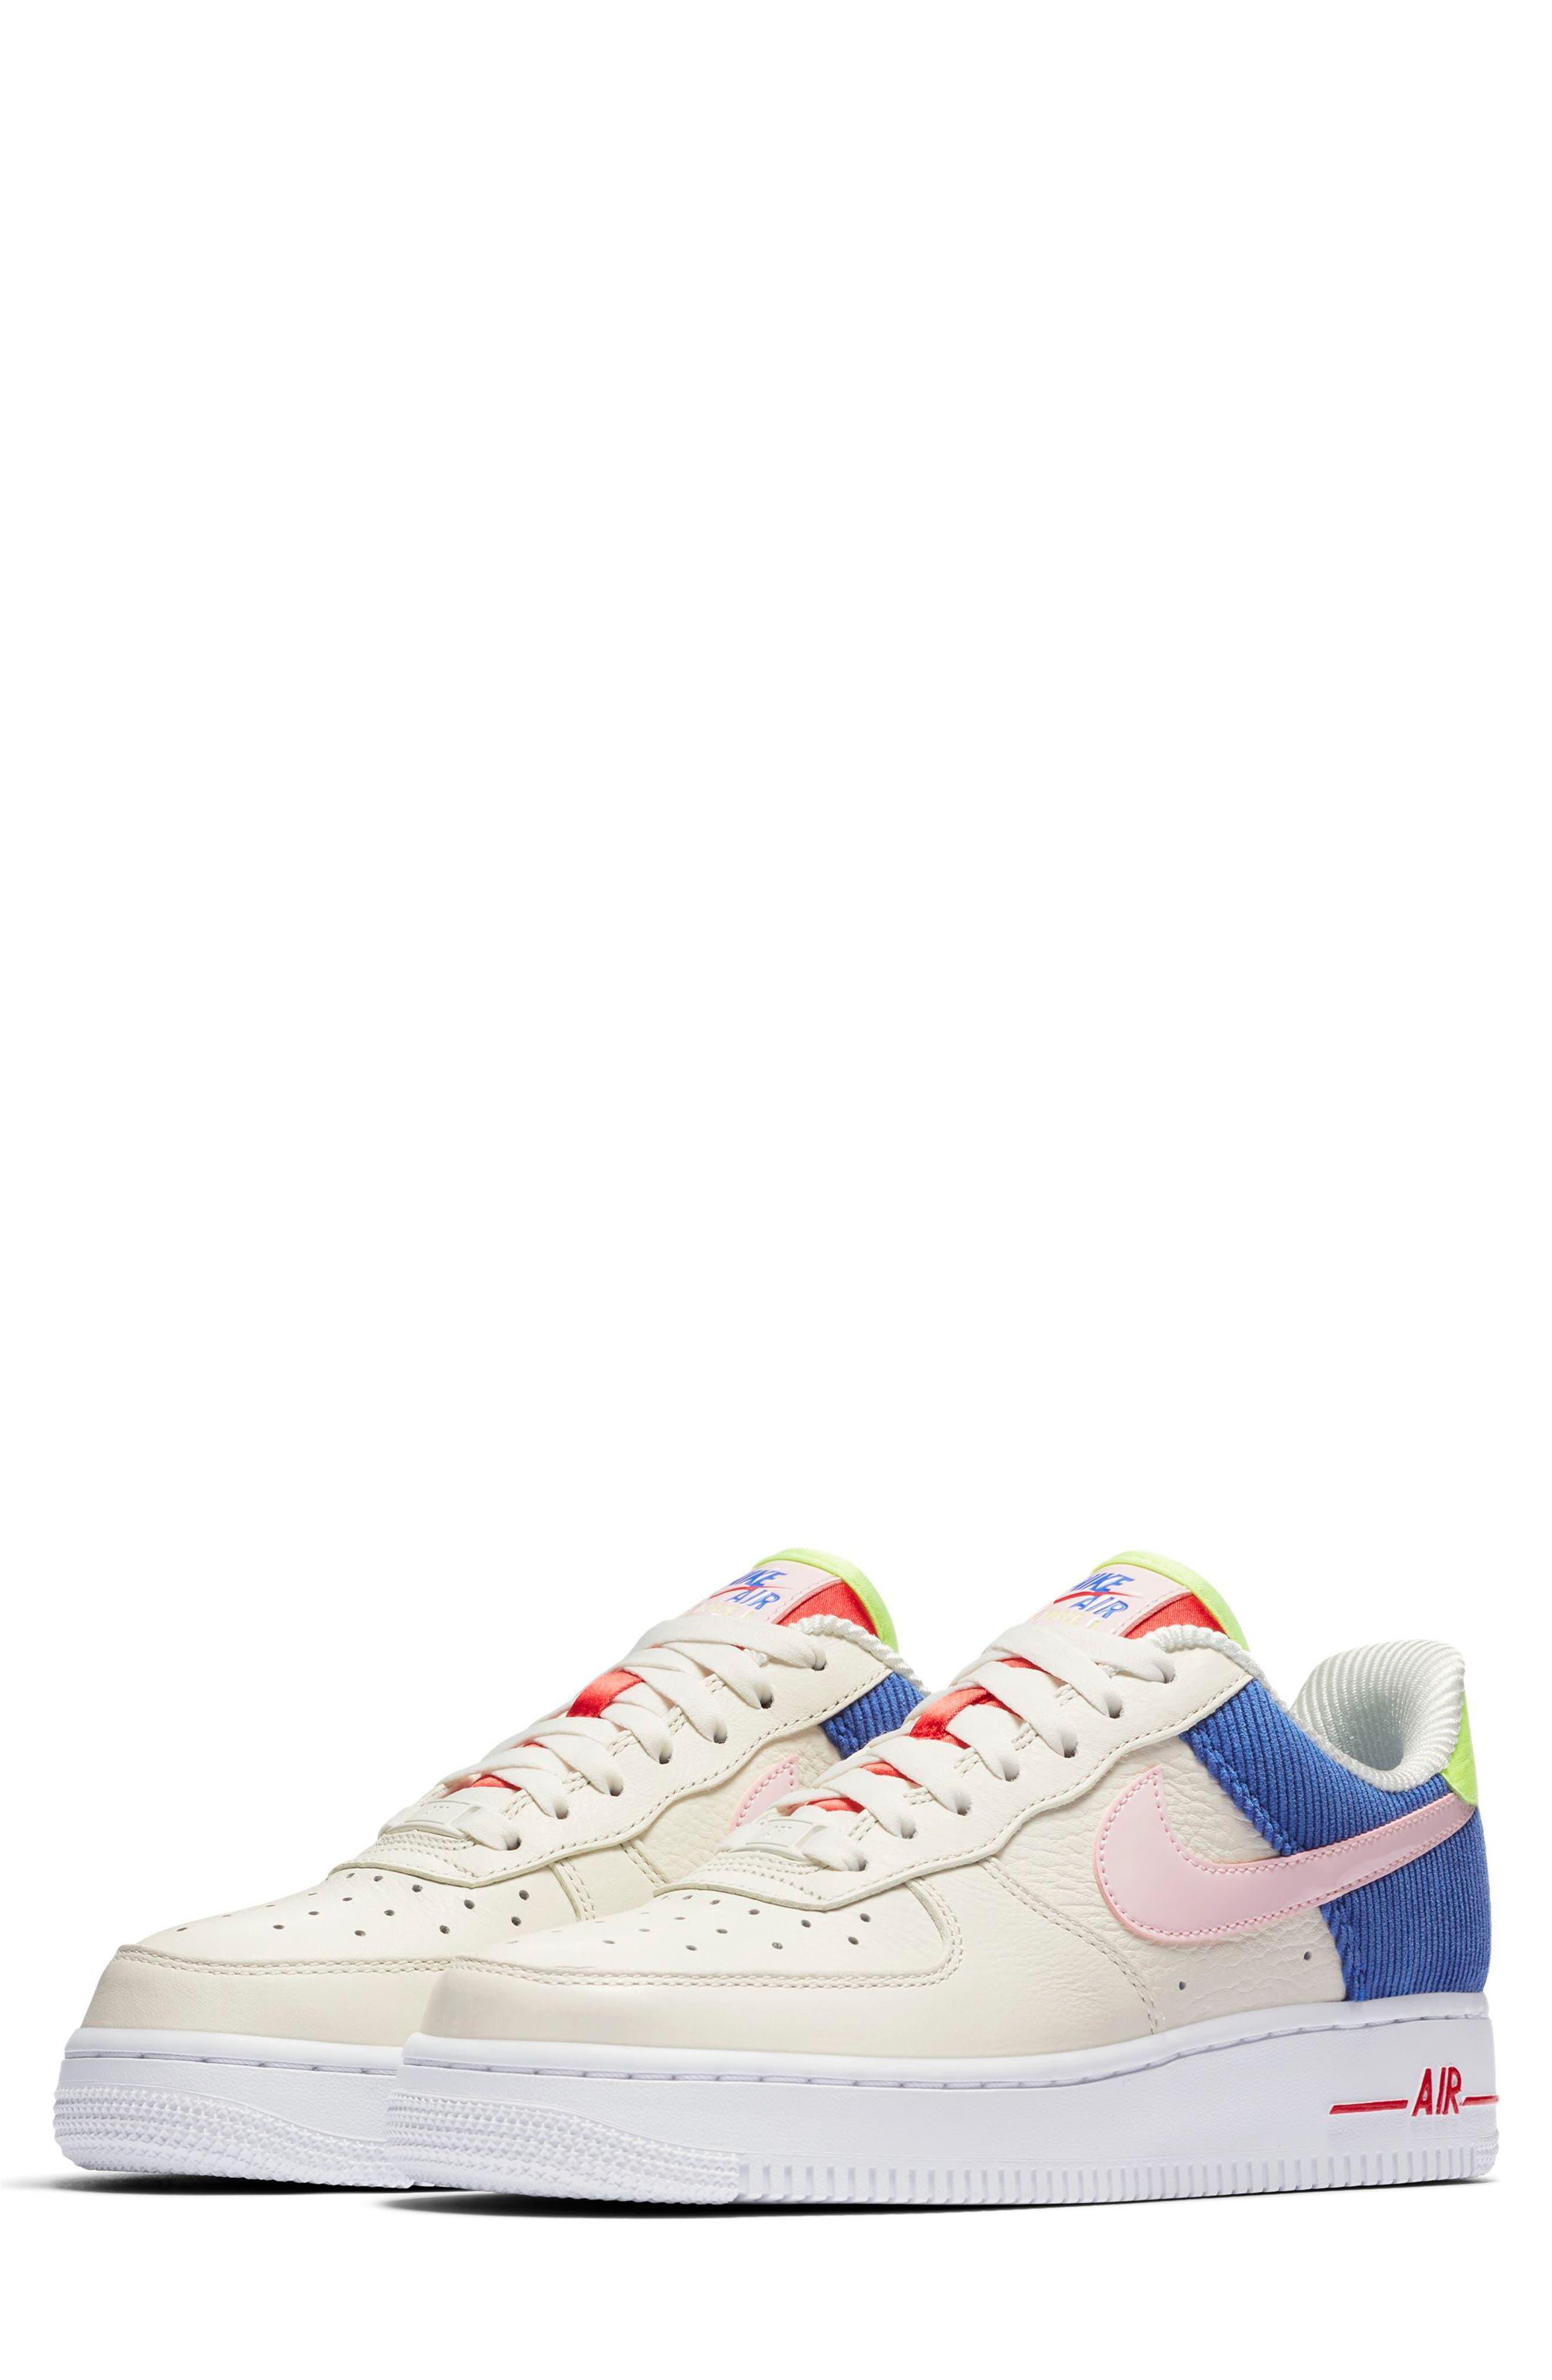 Air Force 1 Low Top Sneaker,                         Main,                         color, Sail/ Arctic Pink-Racer Blue